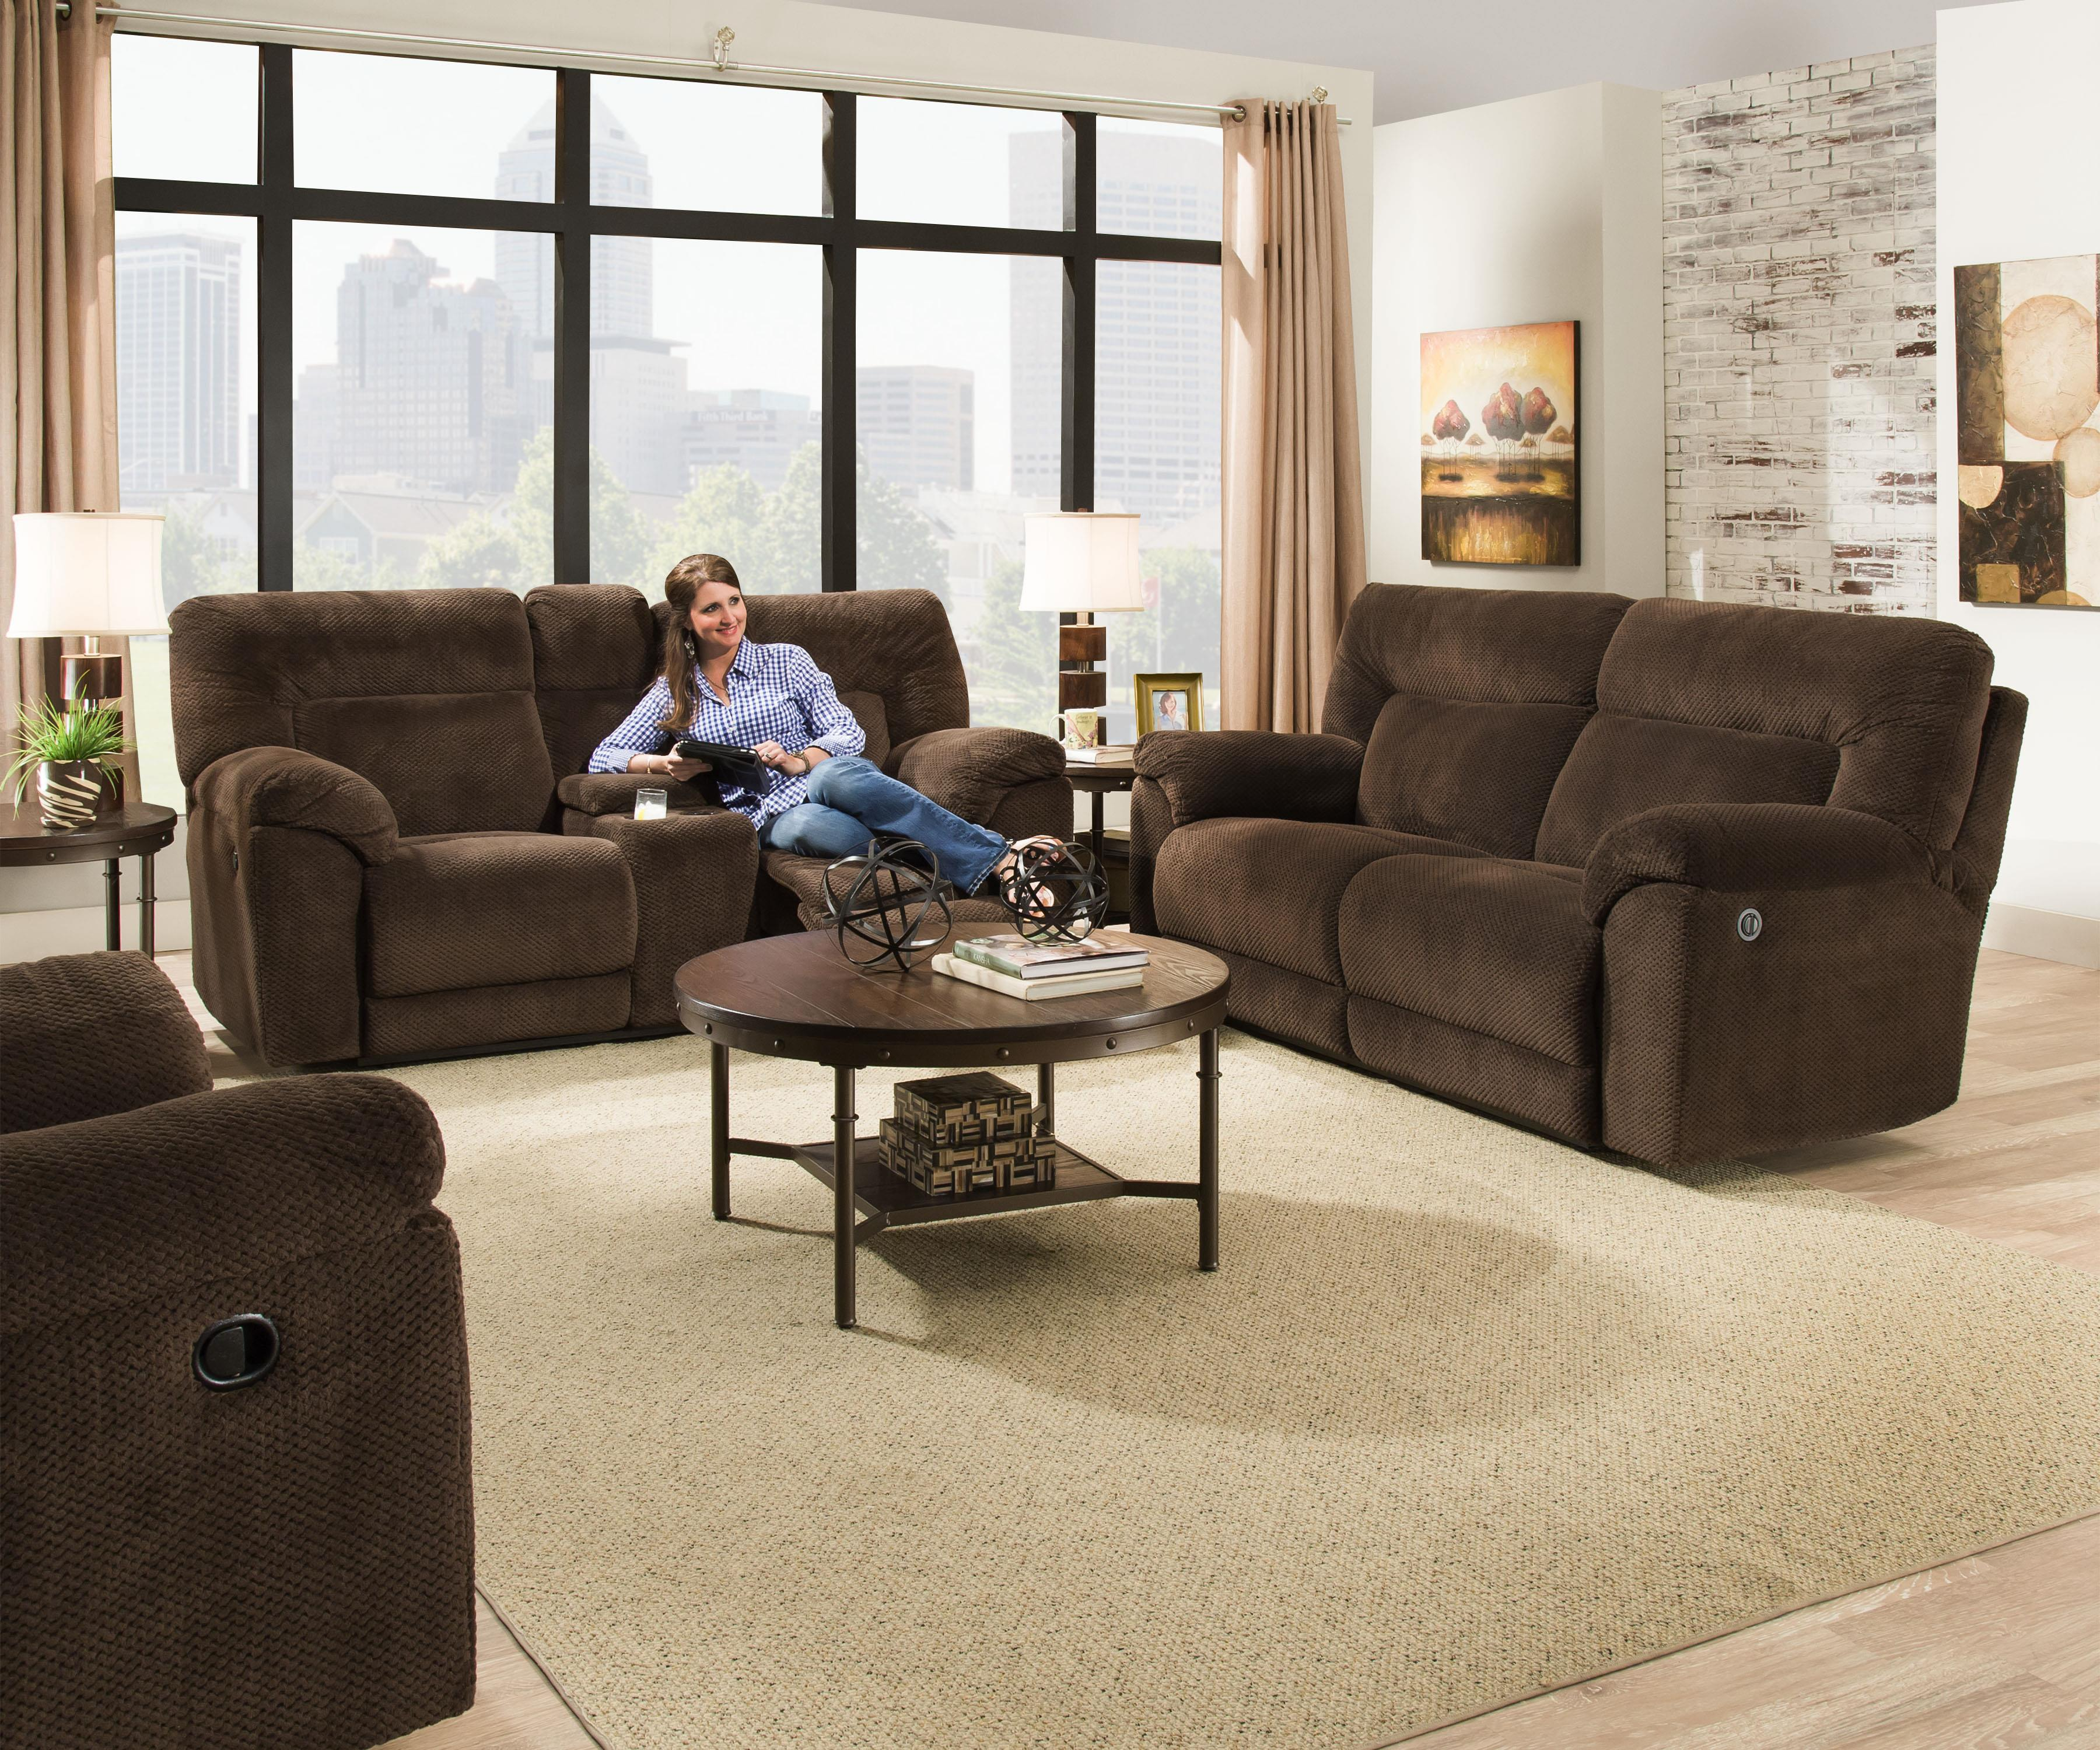 United Furniture Industries 1720 Sofa: United Furniture Industries 50570 50570POWERSOFA Casual